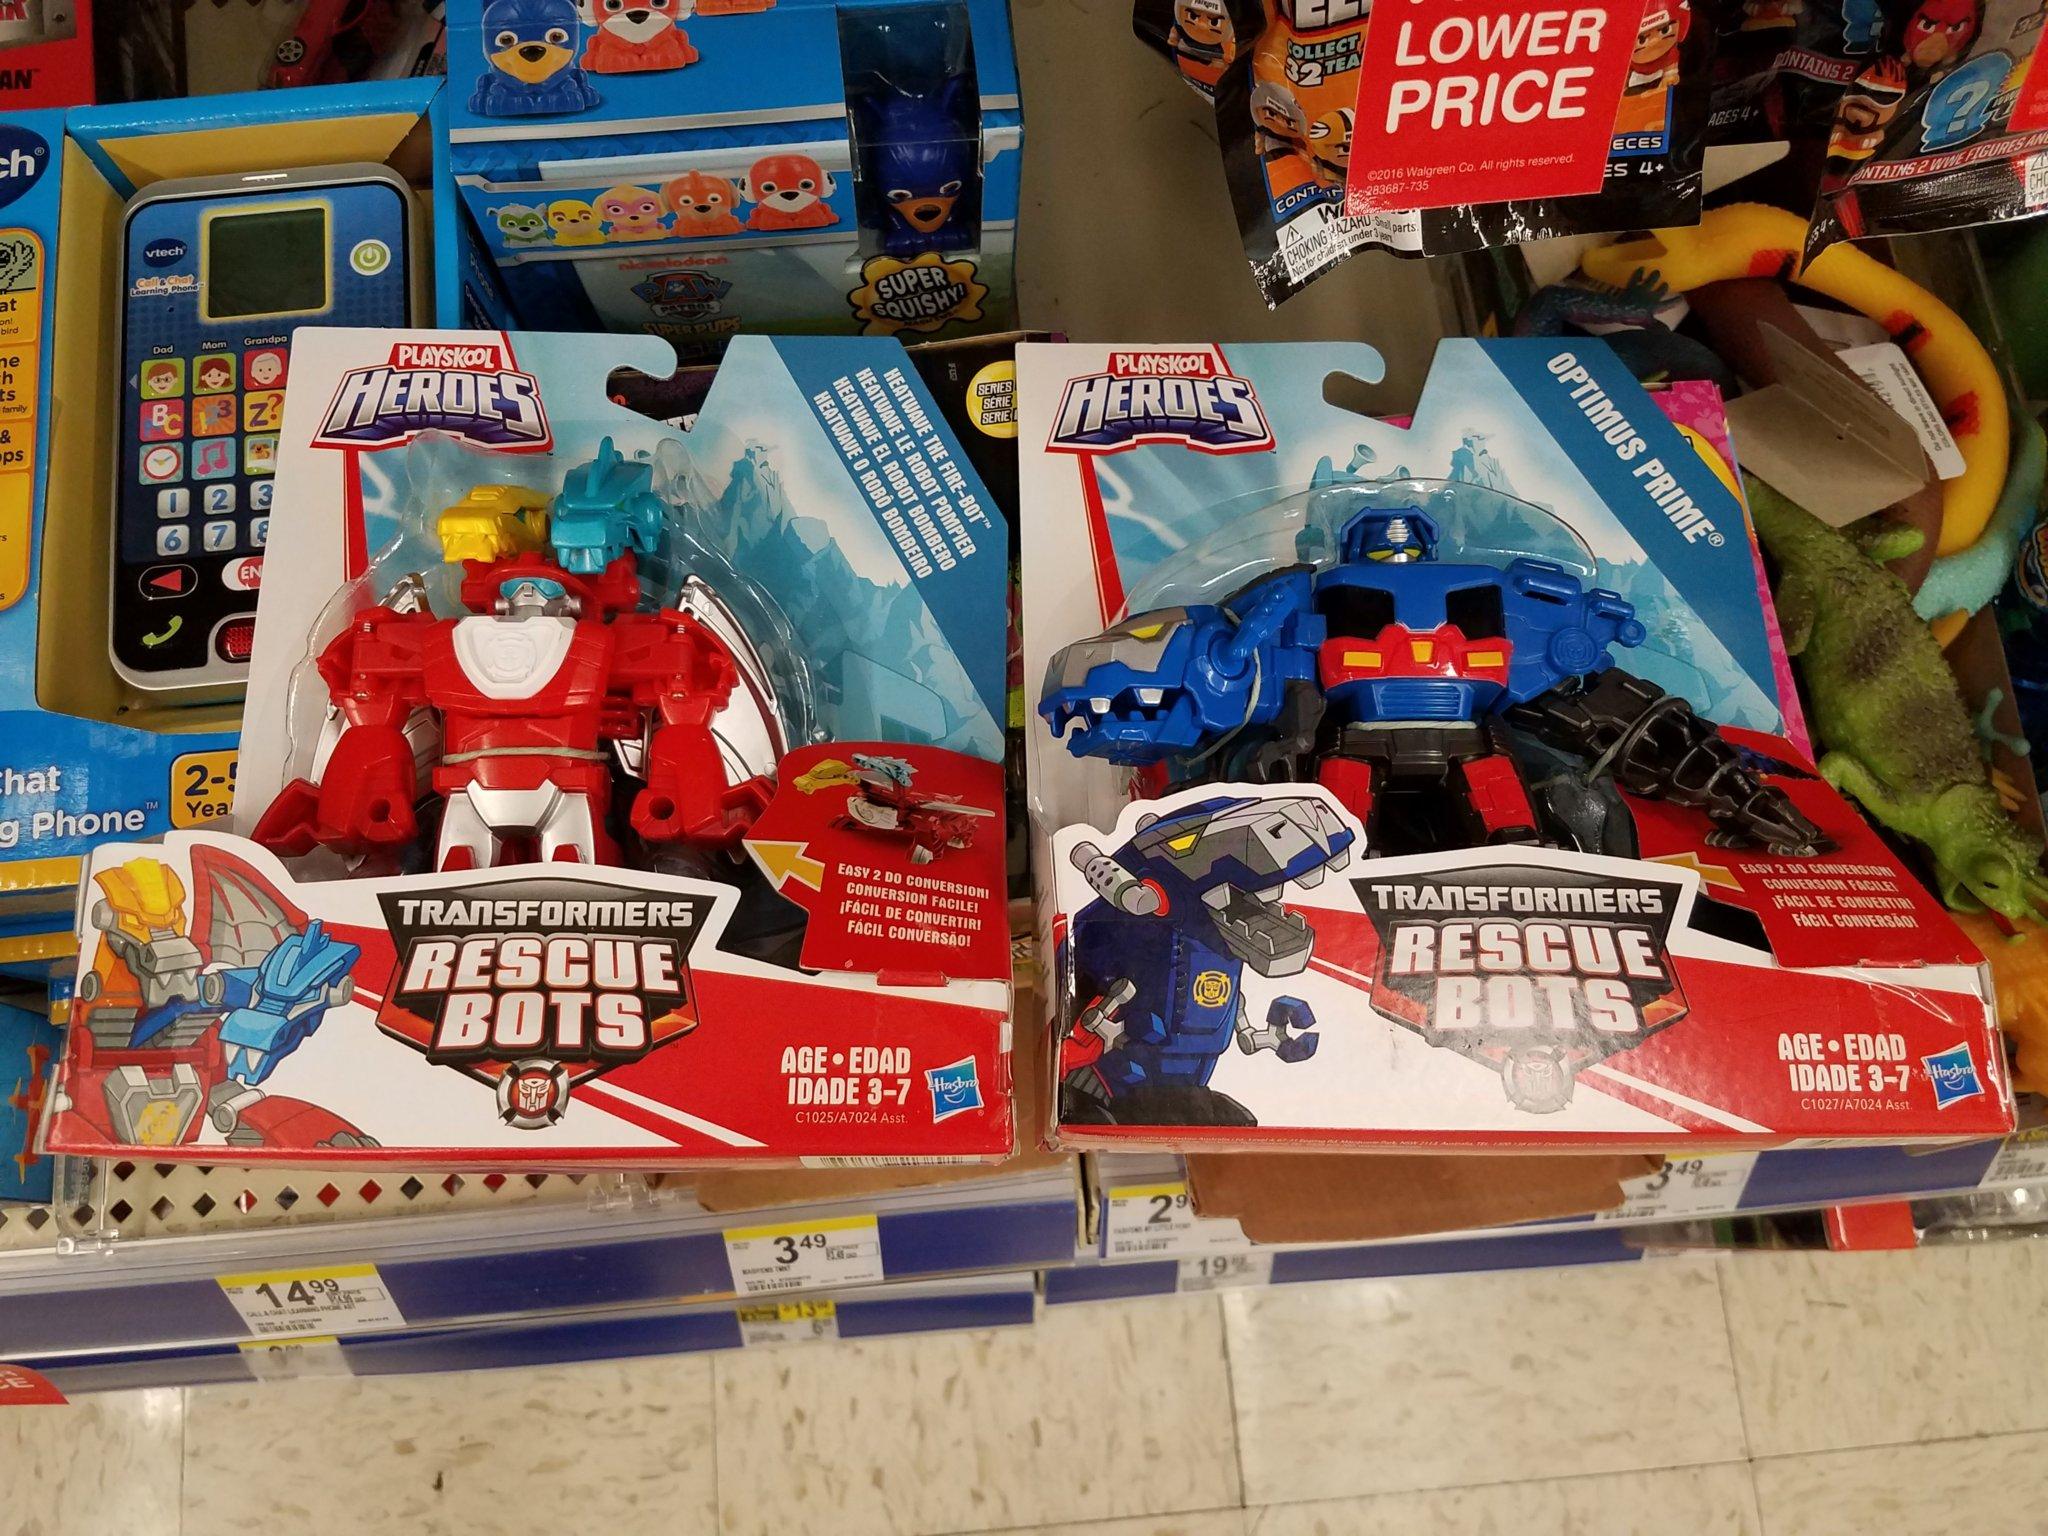 Rescue Bots Heatwave and Optimus Prime US Retail Sighting